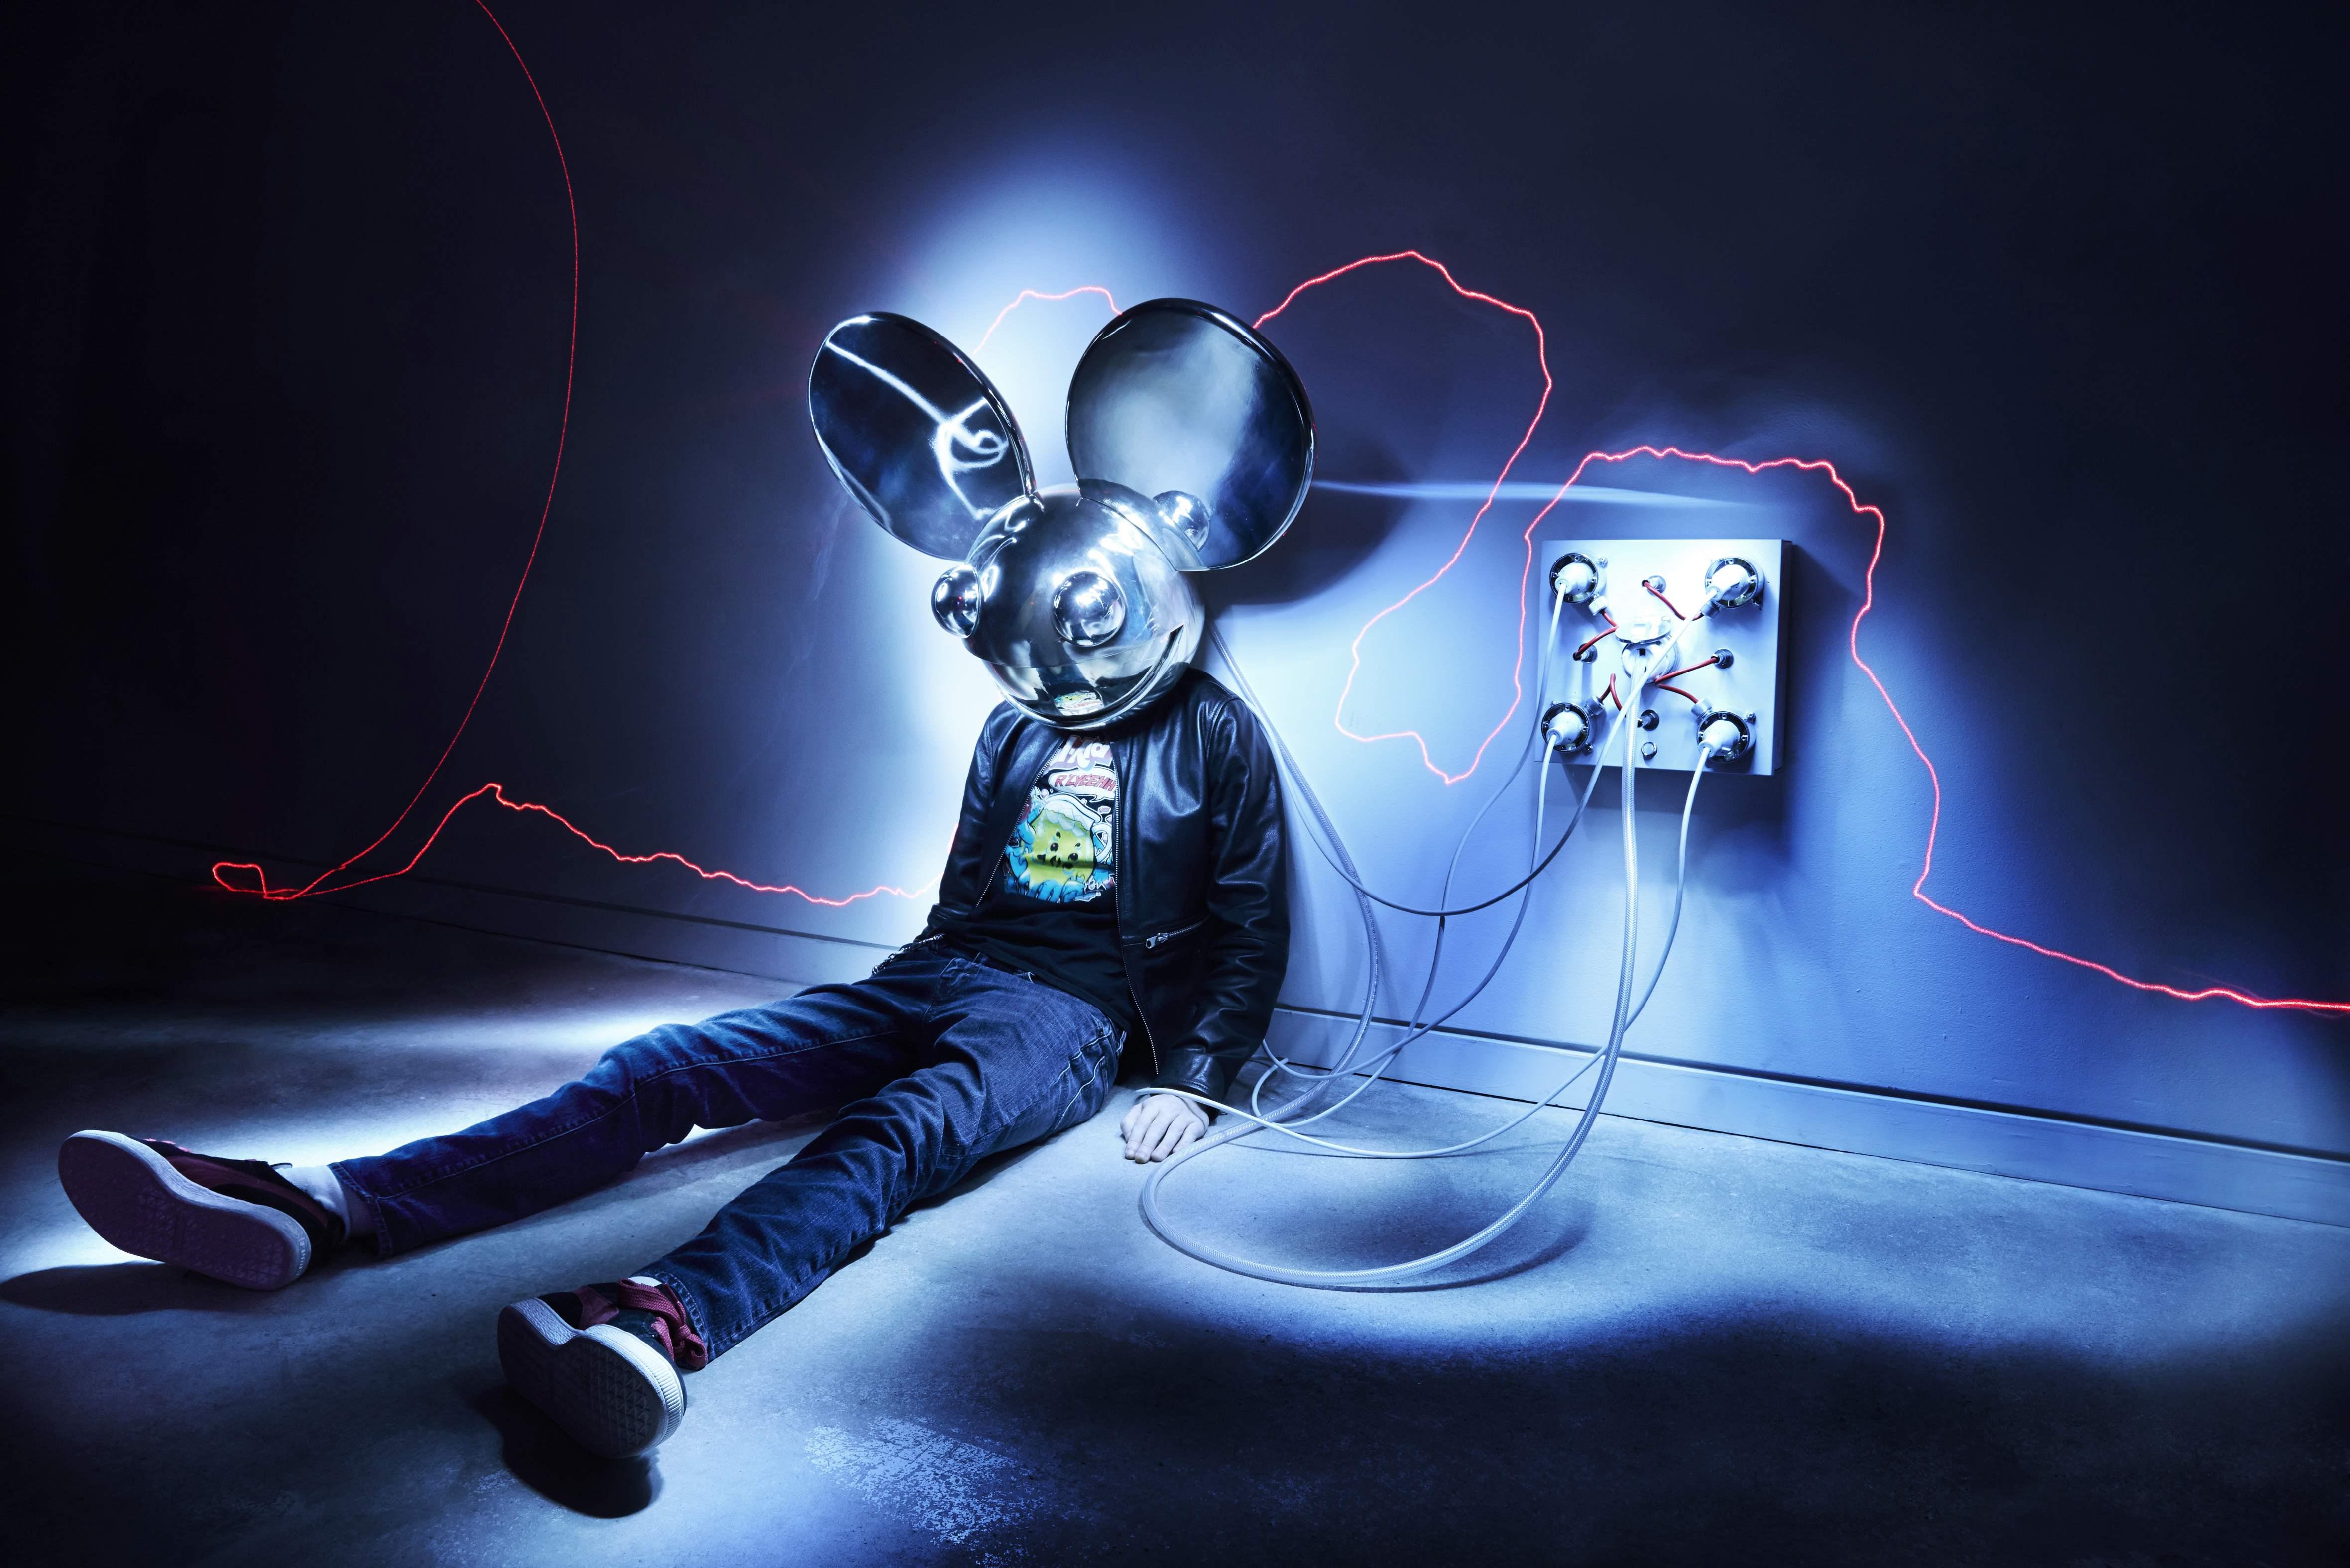 Deadmau5 Dj Hd Music 4k Wallpapers Images Backgrounds Photos